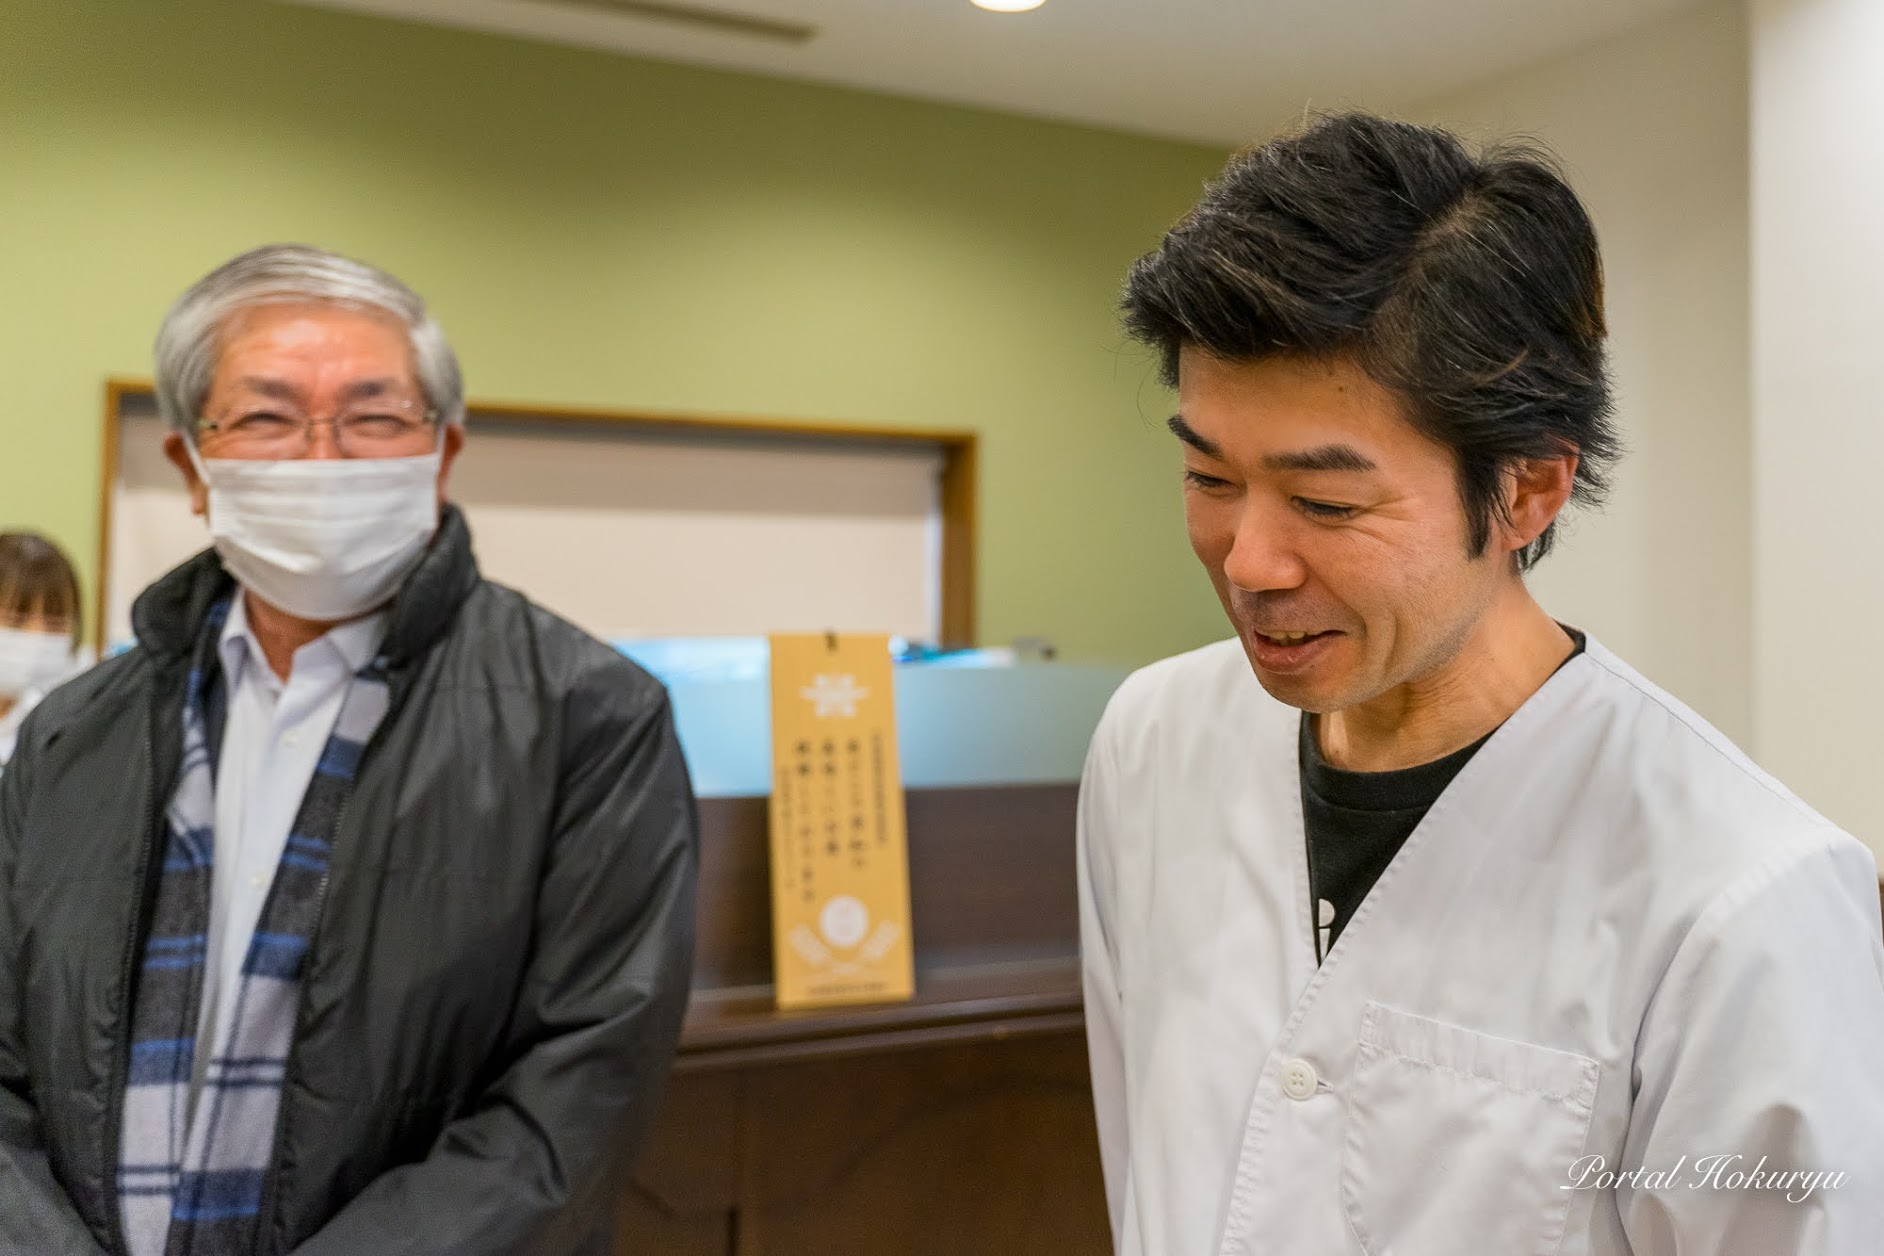 笑顔で見守る黒千石事業協同組合・高田幸男 理事長